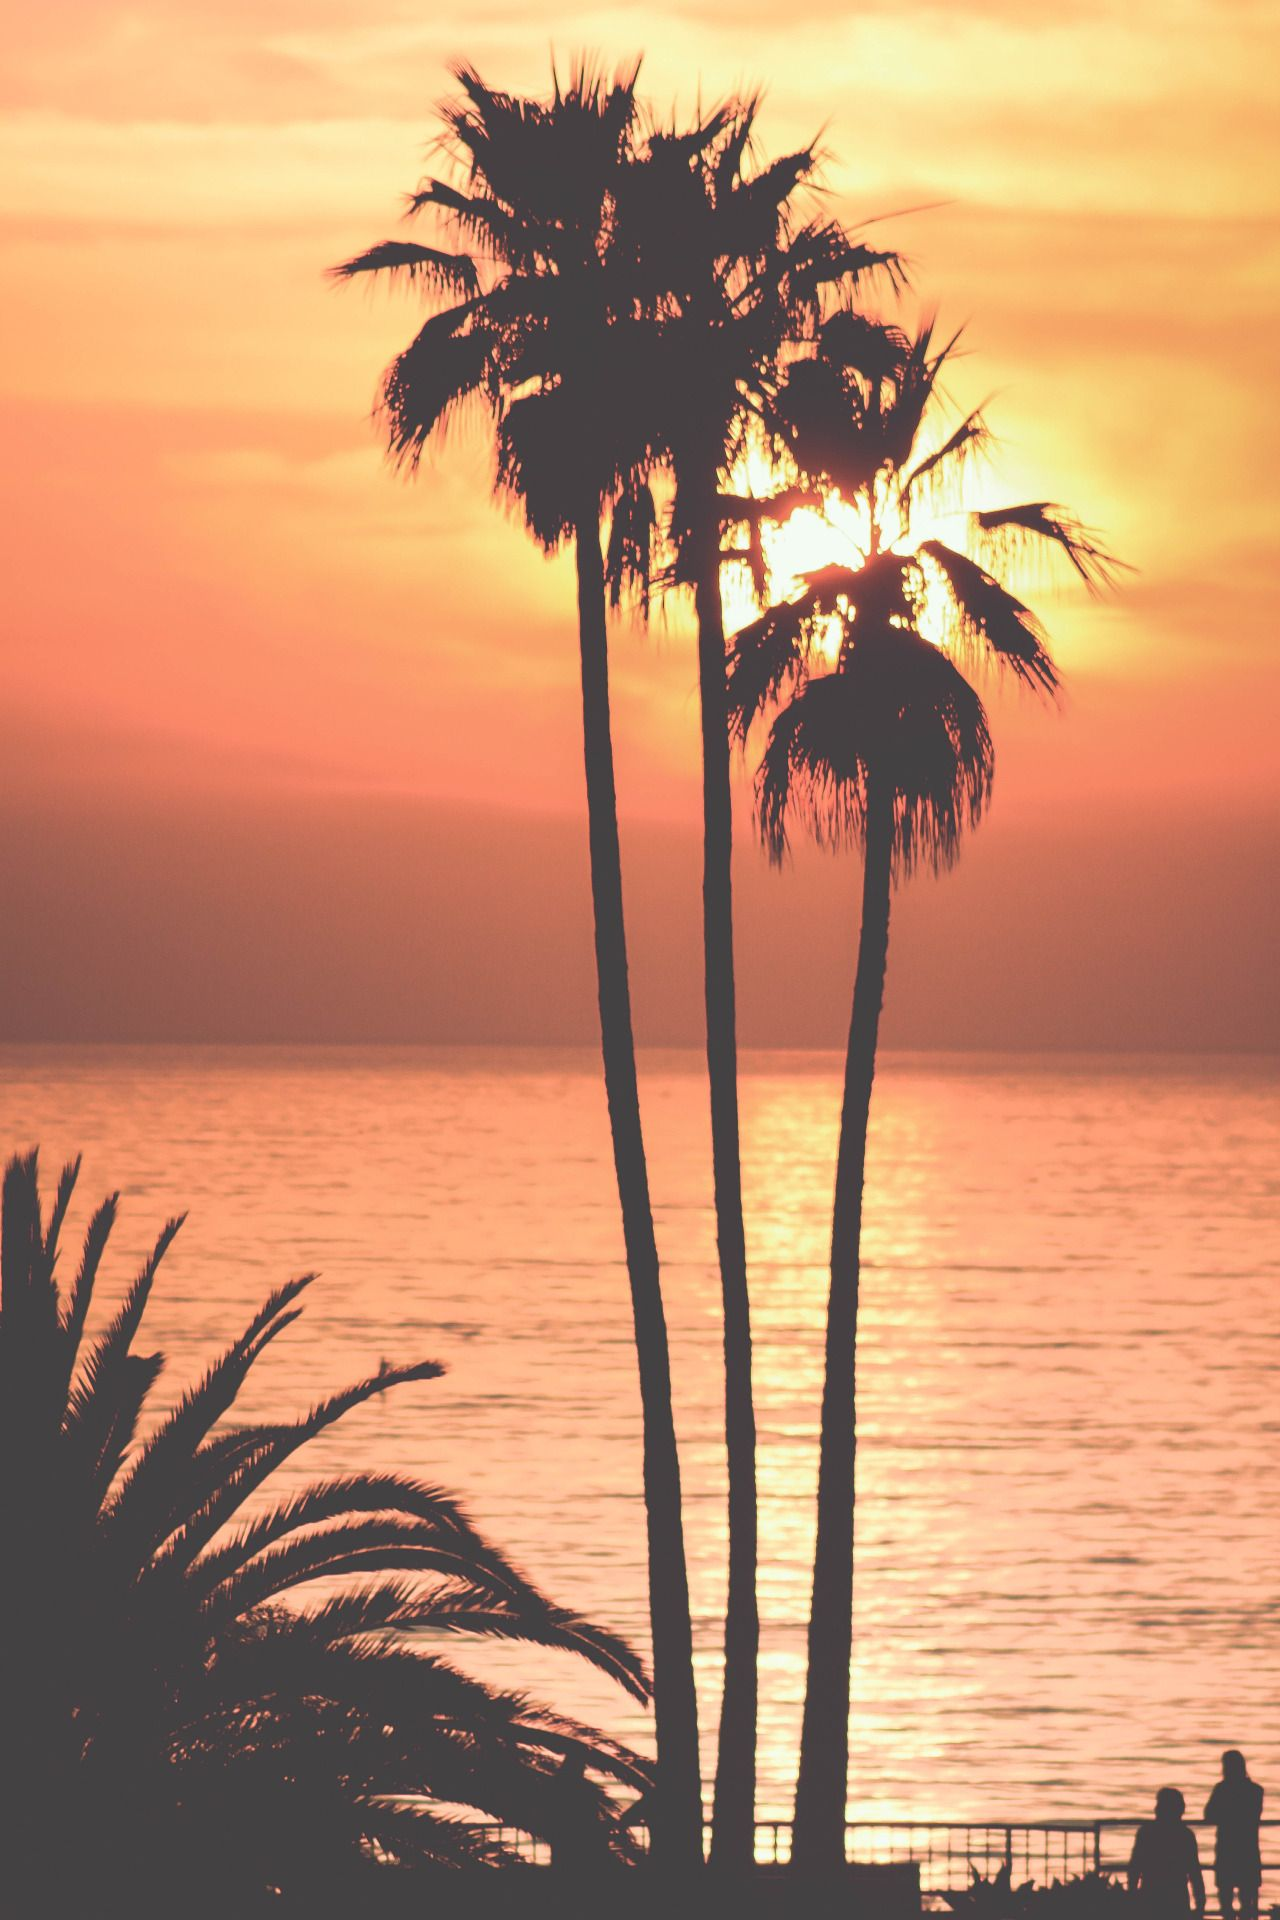 Via Natureac Natureactumblr Post 131683281308 Sunset Beach CaliforniaCalifornia